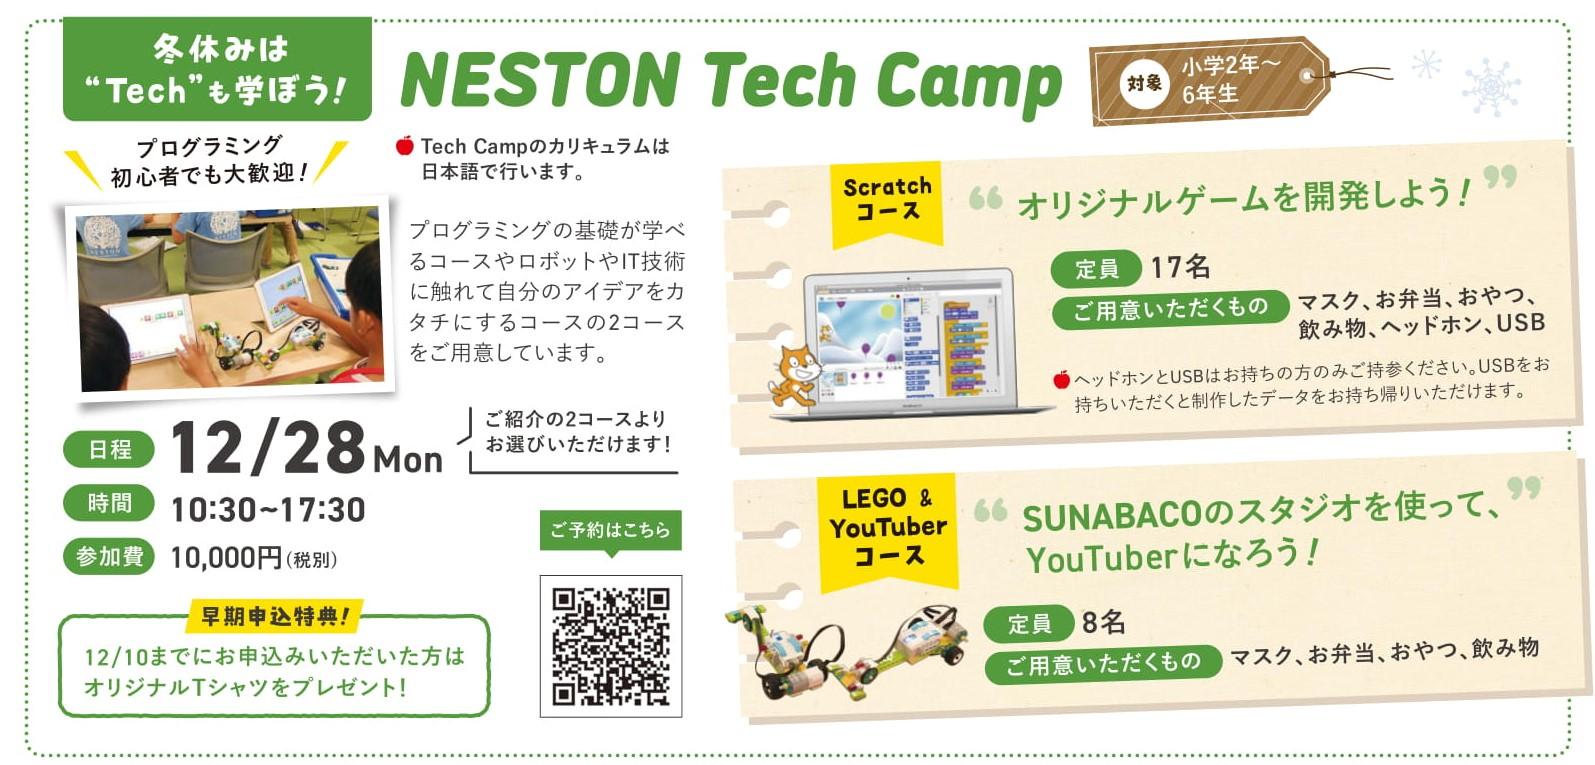 NESTON Tech Camp